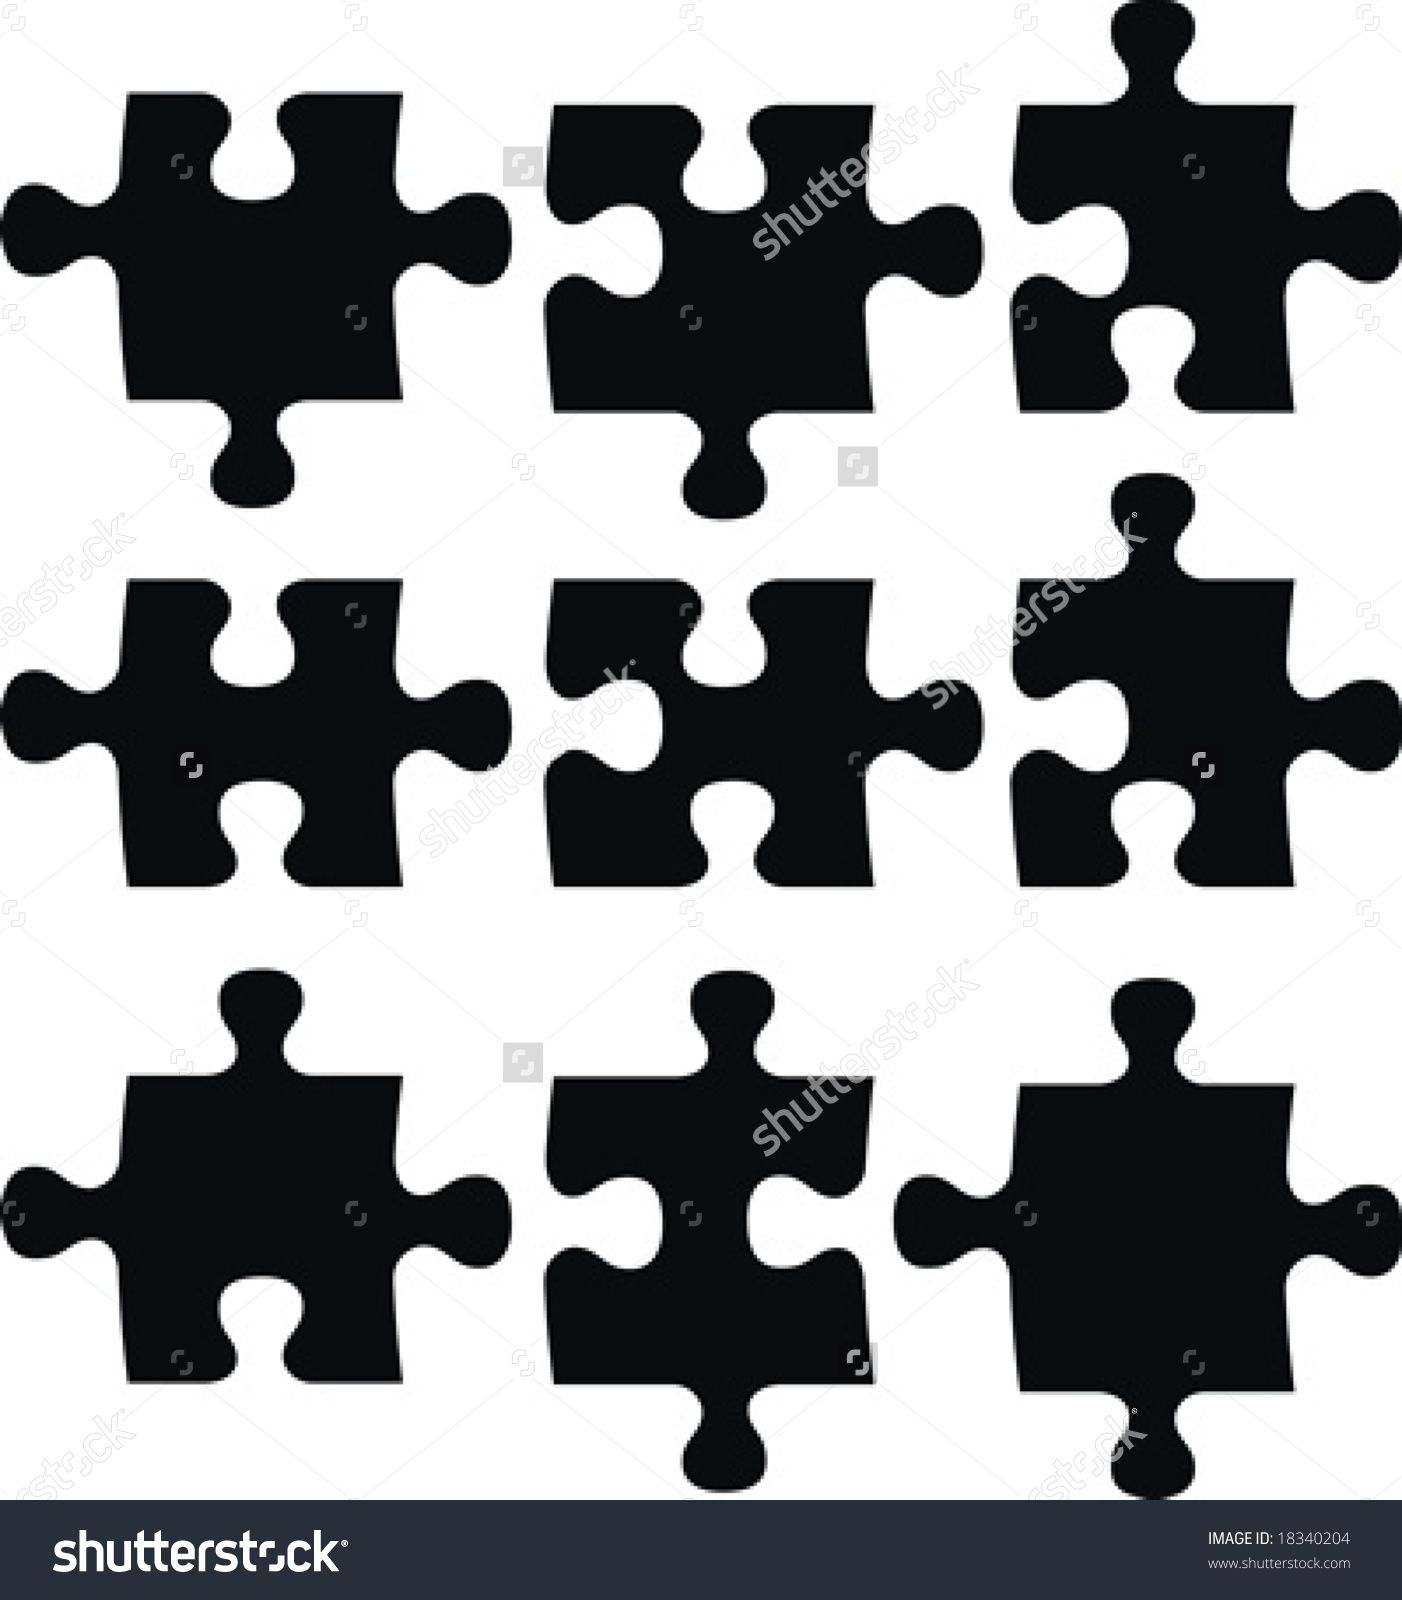 17 Best images about Puzzle Pieces on Pinterest | Teaching, Clip ...